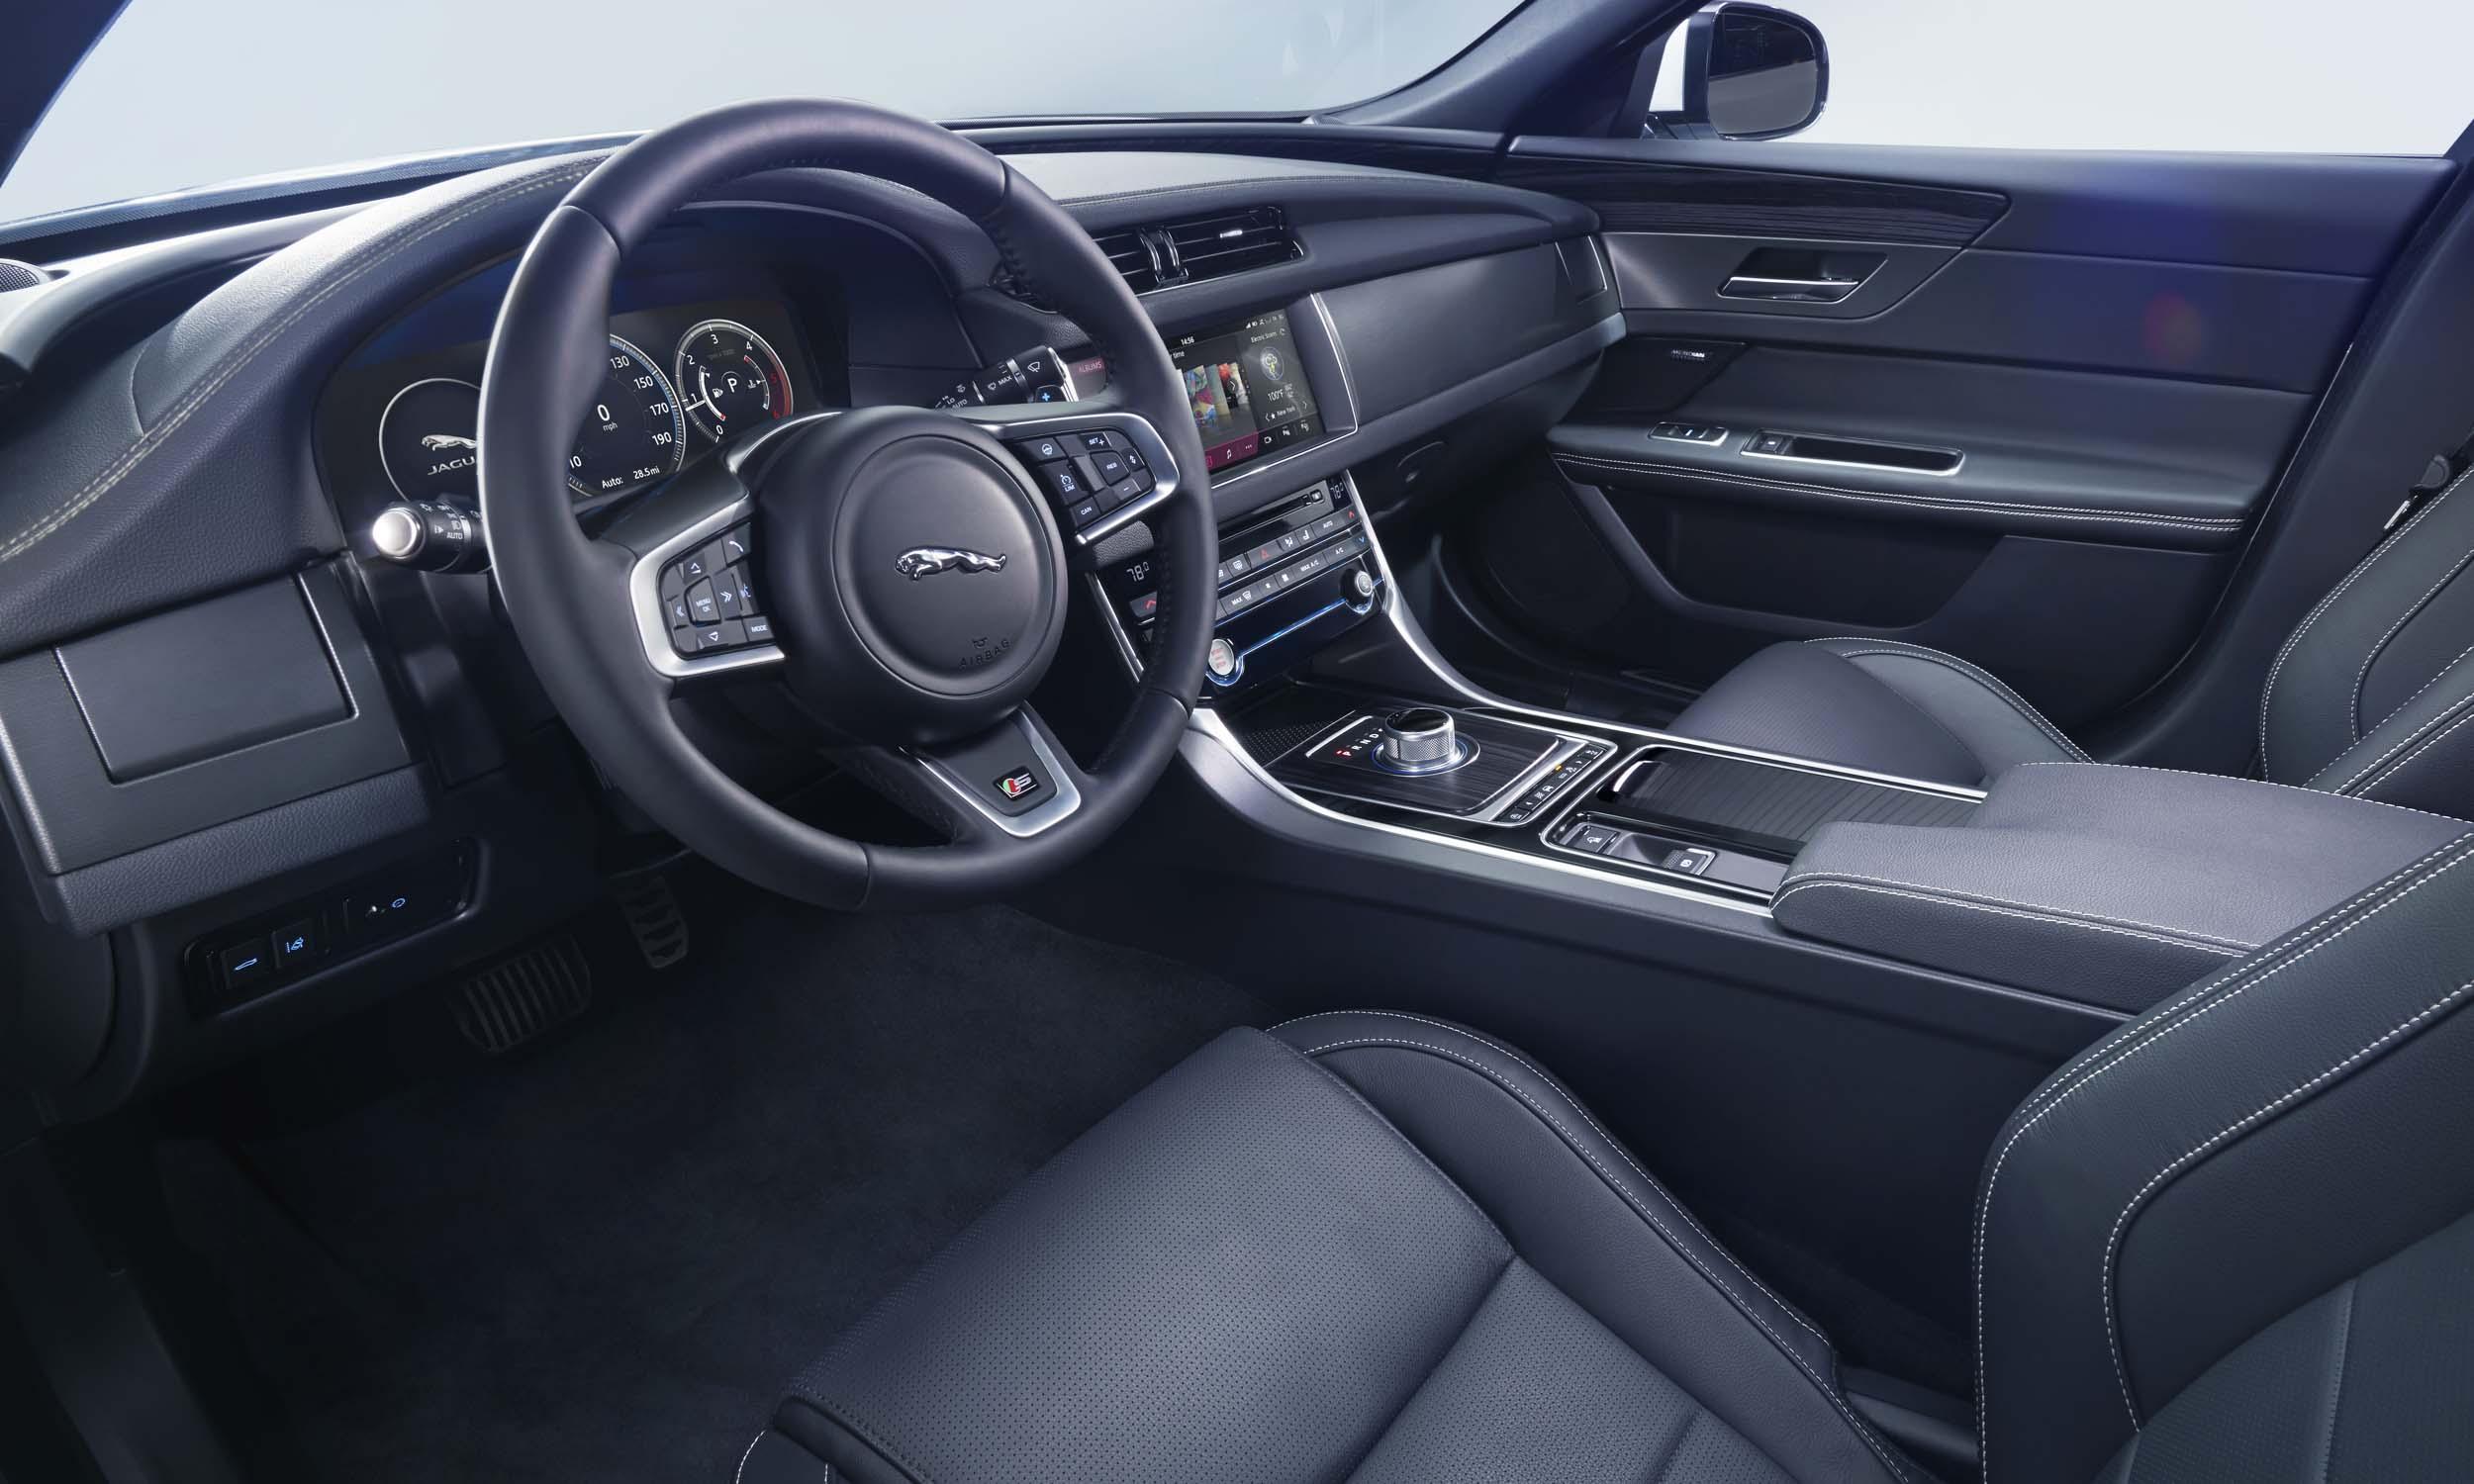 © Jaguar Land Rover North America, LLC